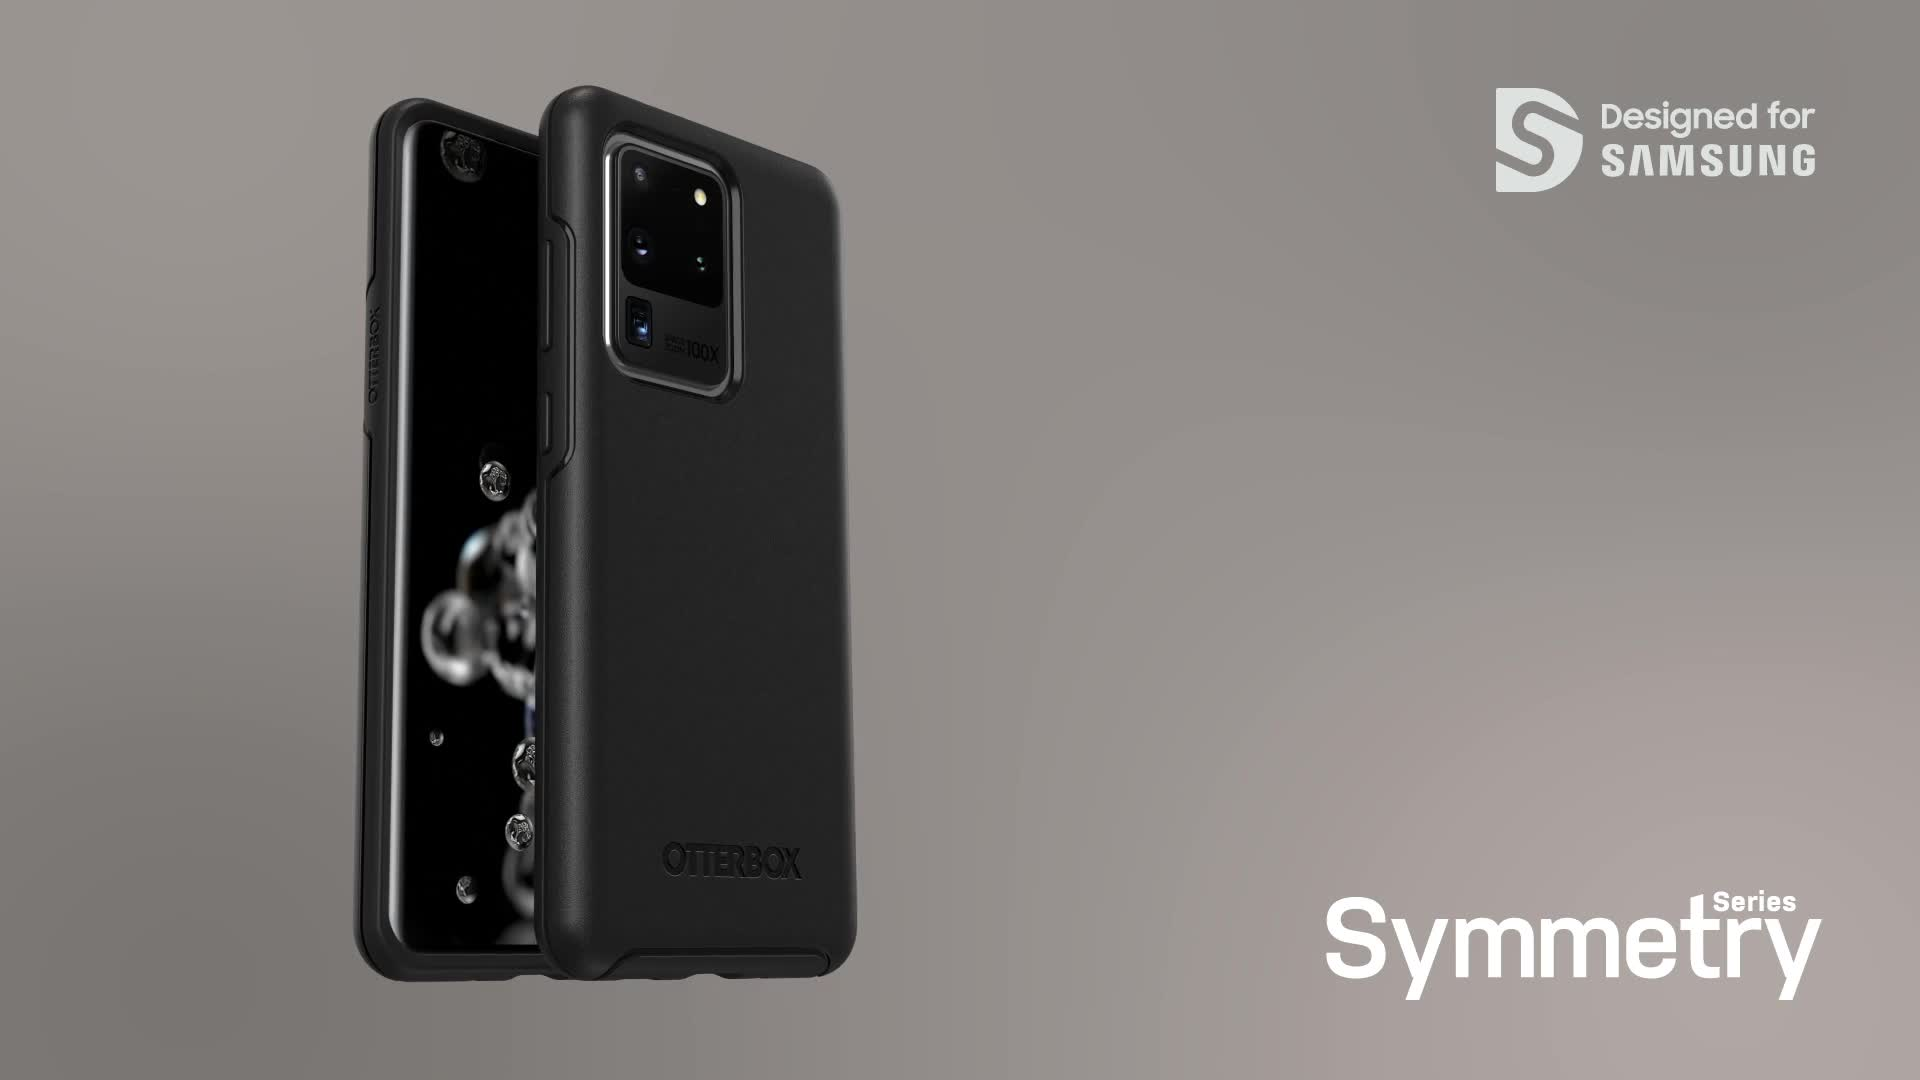 Negra sin Caja Retail Funda Anti-Ca/ídas Fina y Elegante para Samsung Galaxy S20 Ultra Otterbox Symmetry